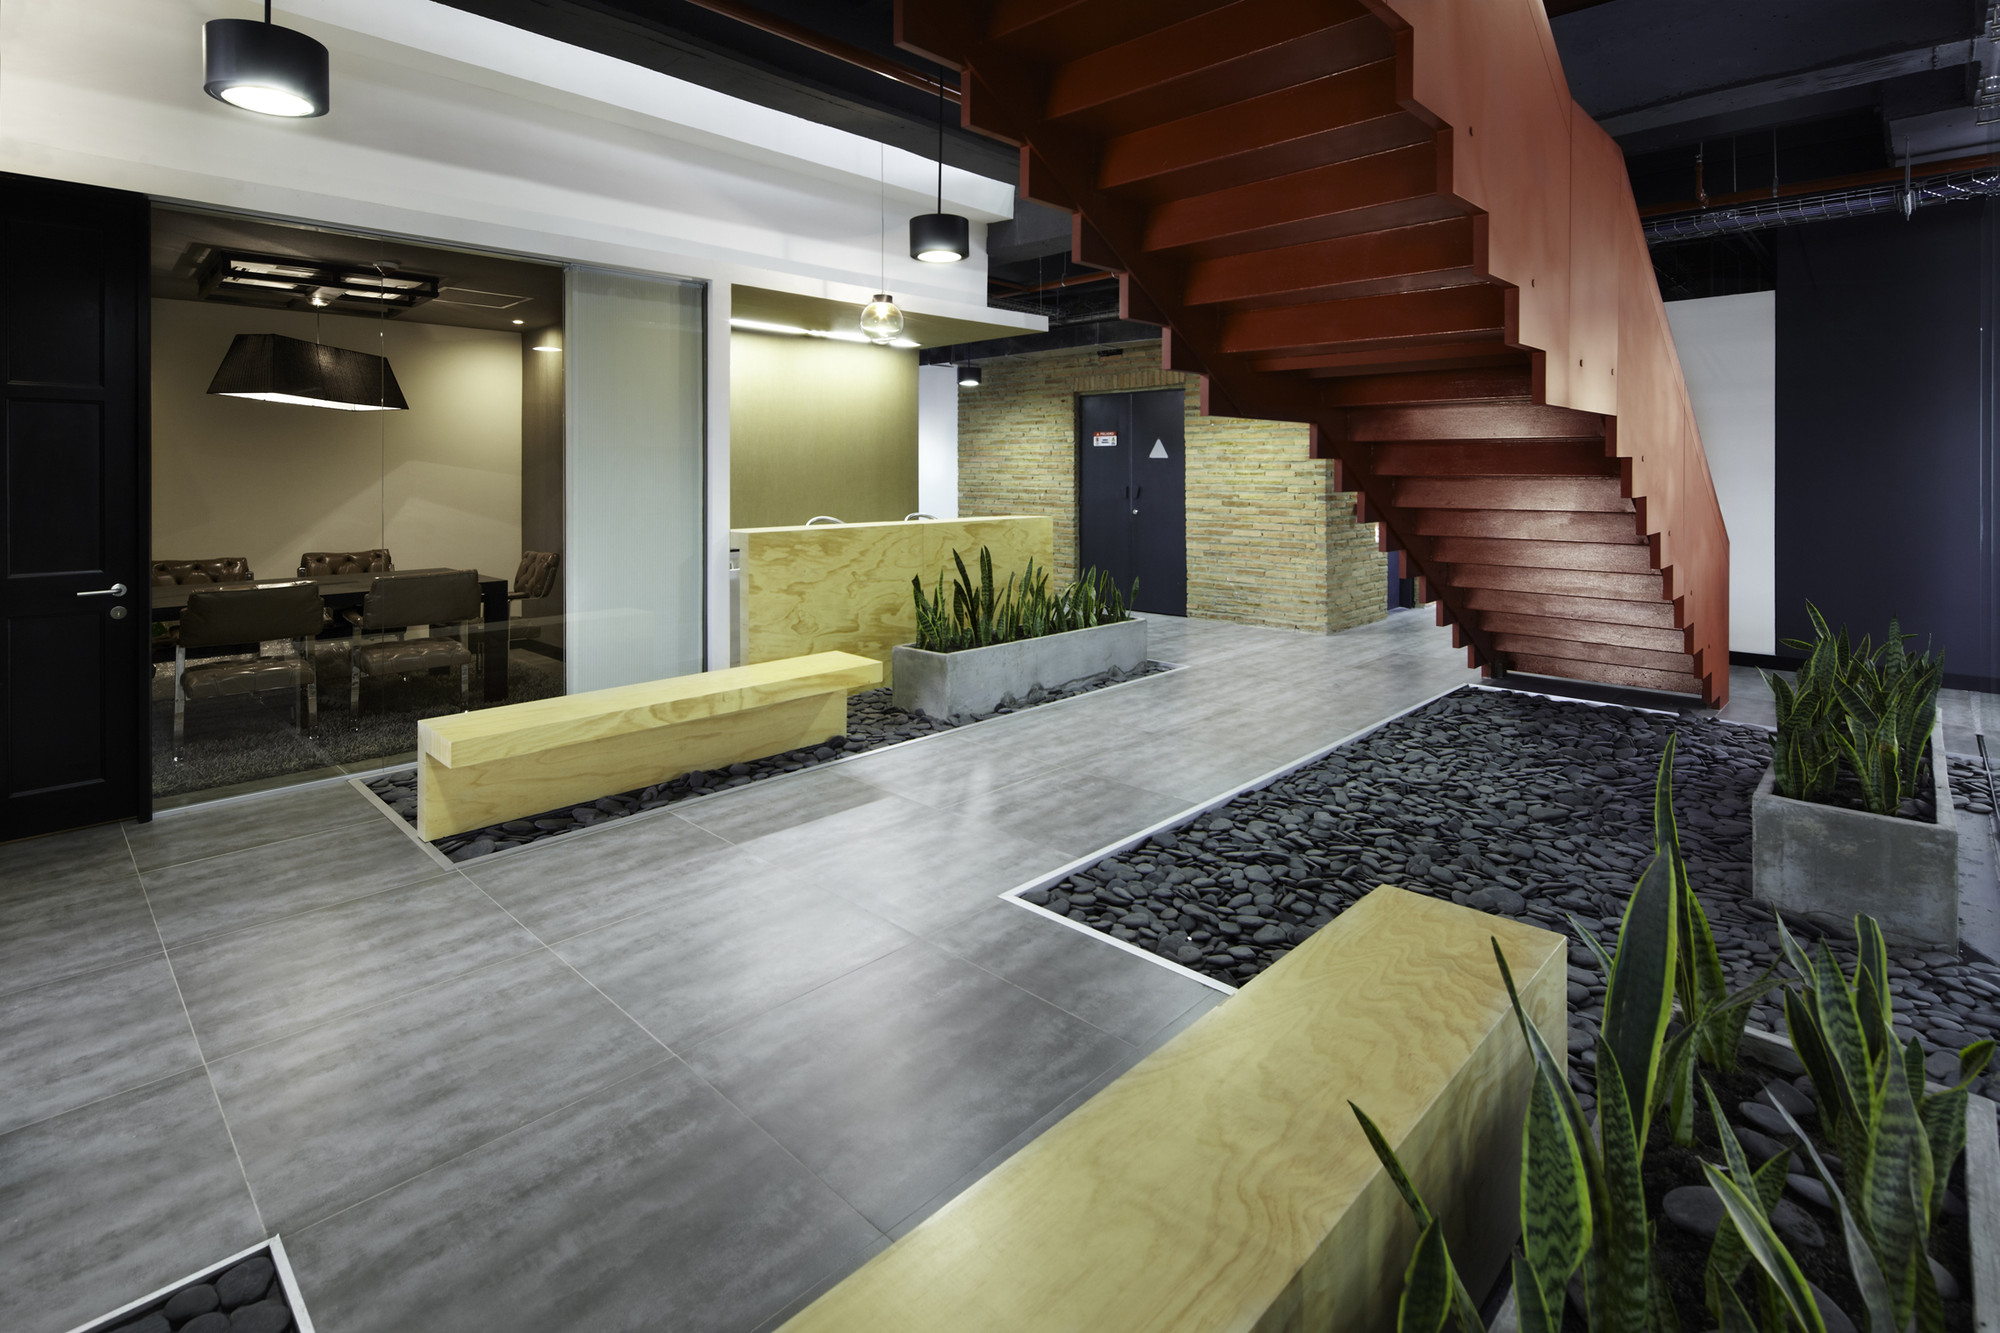 Galer a de oficinas jwt aei arquitectura e interiores 8 - Arquitectos de interiores famosos ...